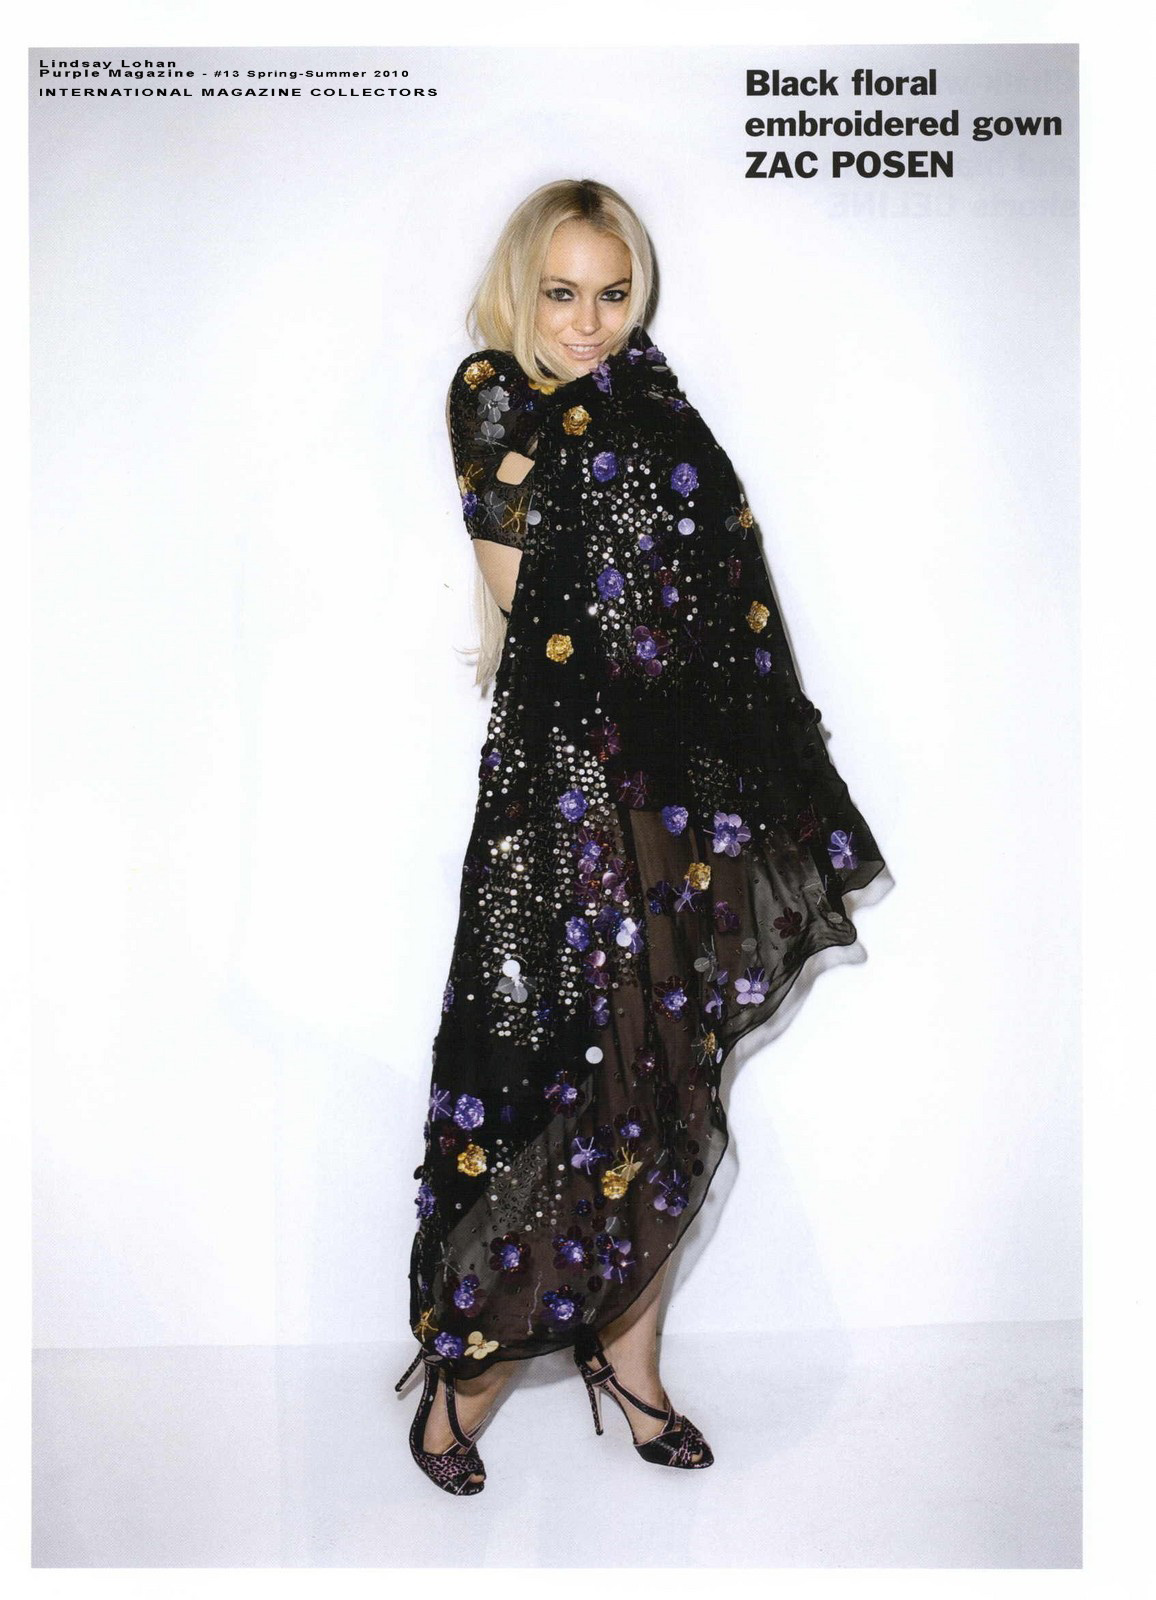 Lindsay Lohan 2010 : lindsay-lohan-in-purple-magazine-2010-14